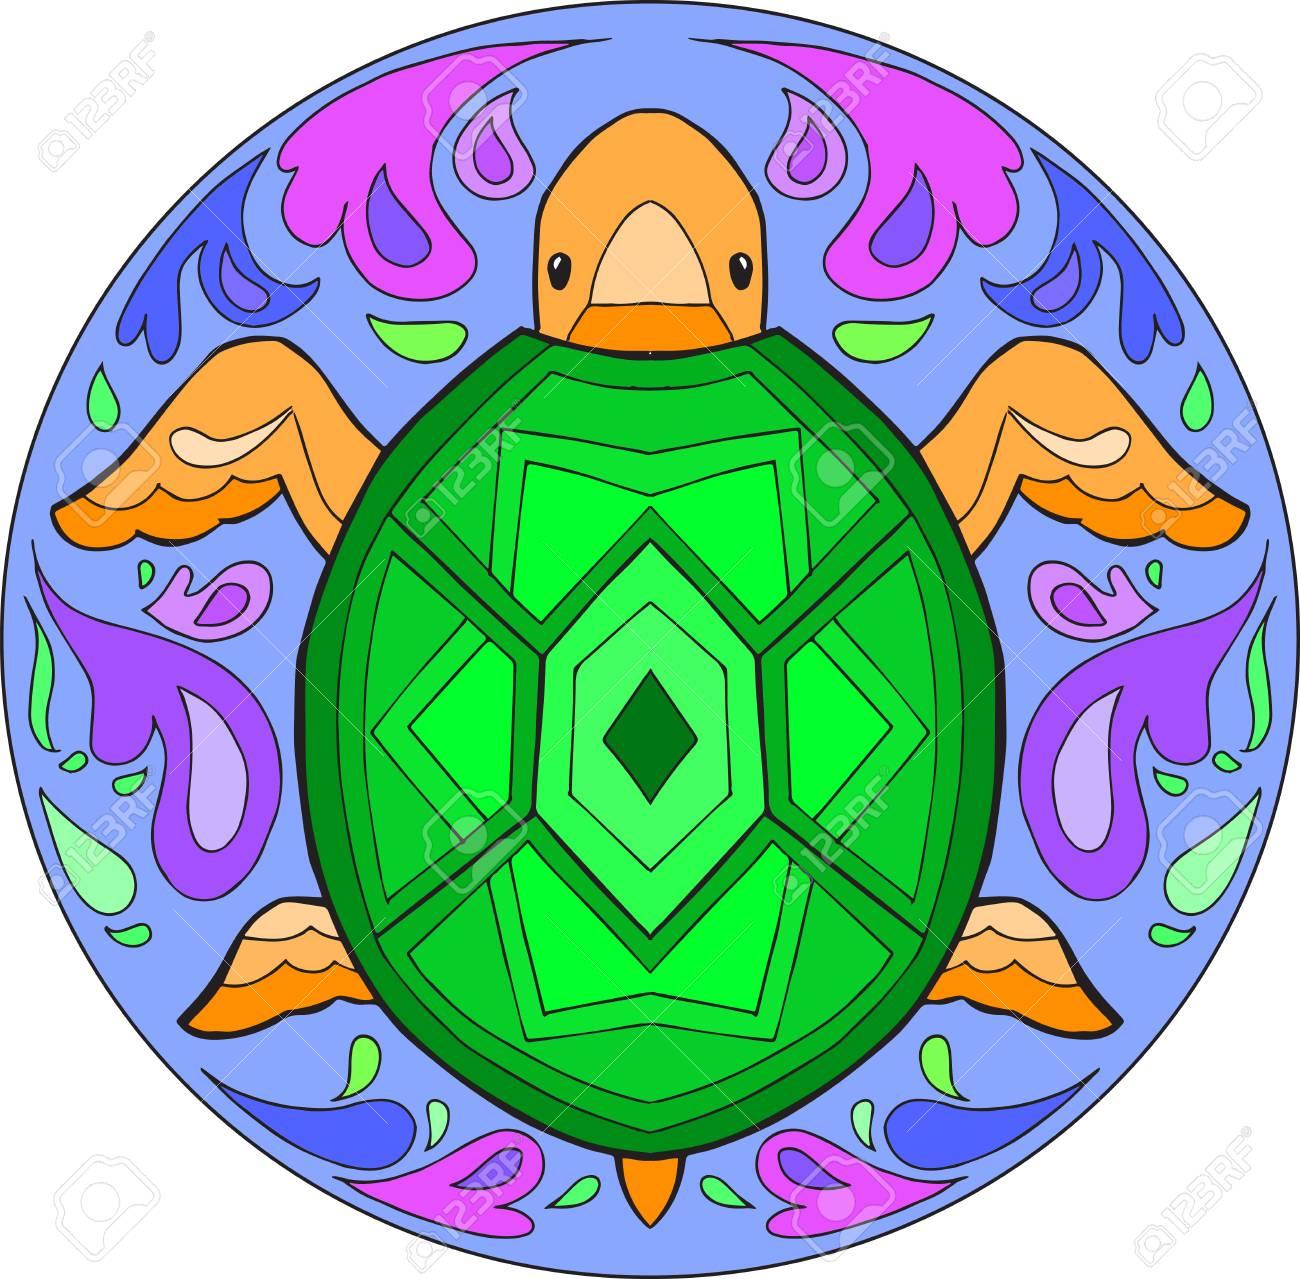 Coloriage Mandala De Tortue.Mandala A Colorier Decoratif Avec Tortue Dans L Eau